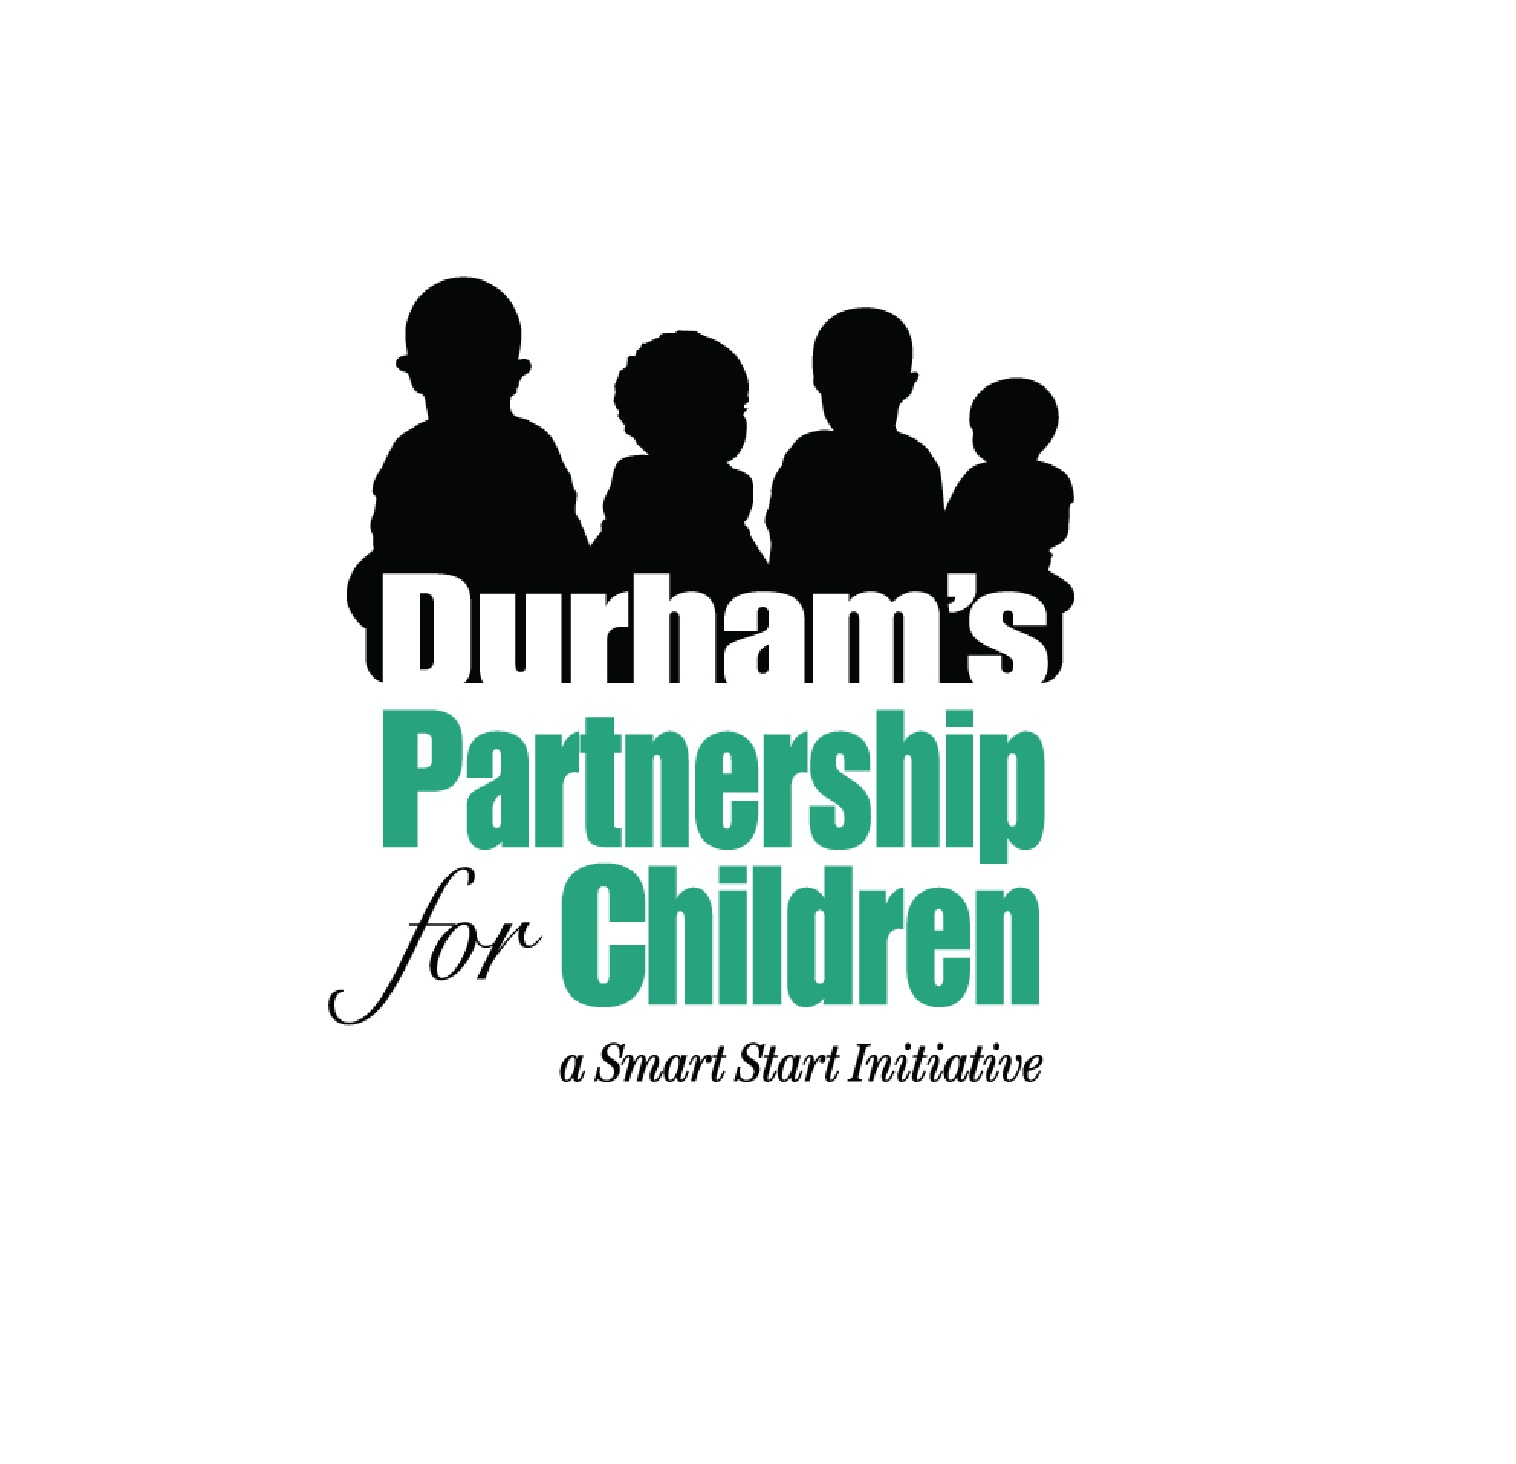 Durham's Partnership for Children